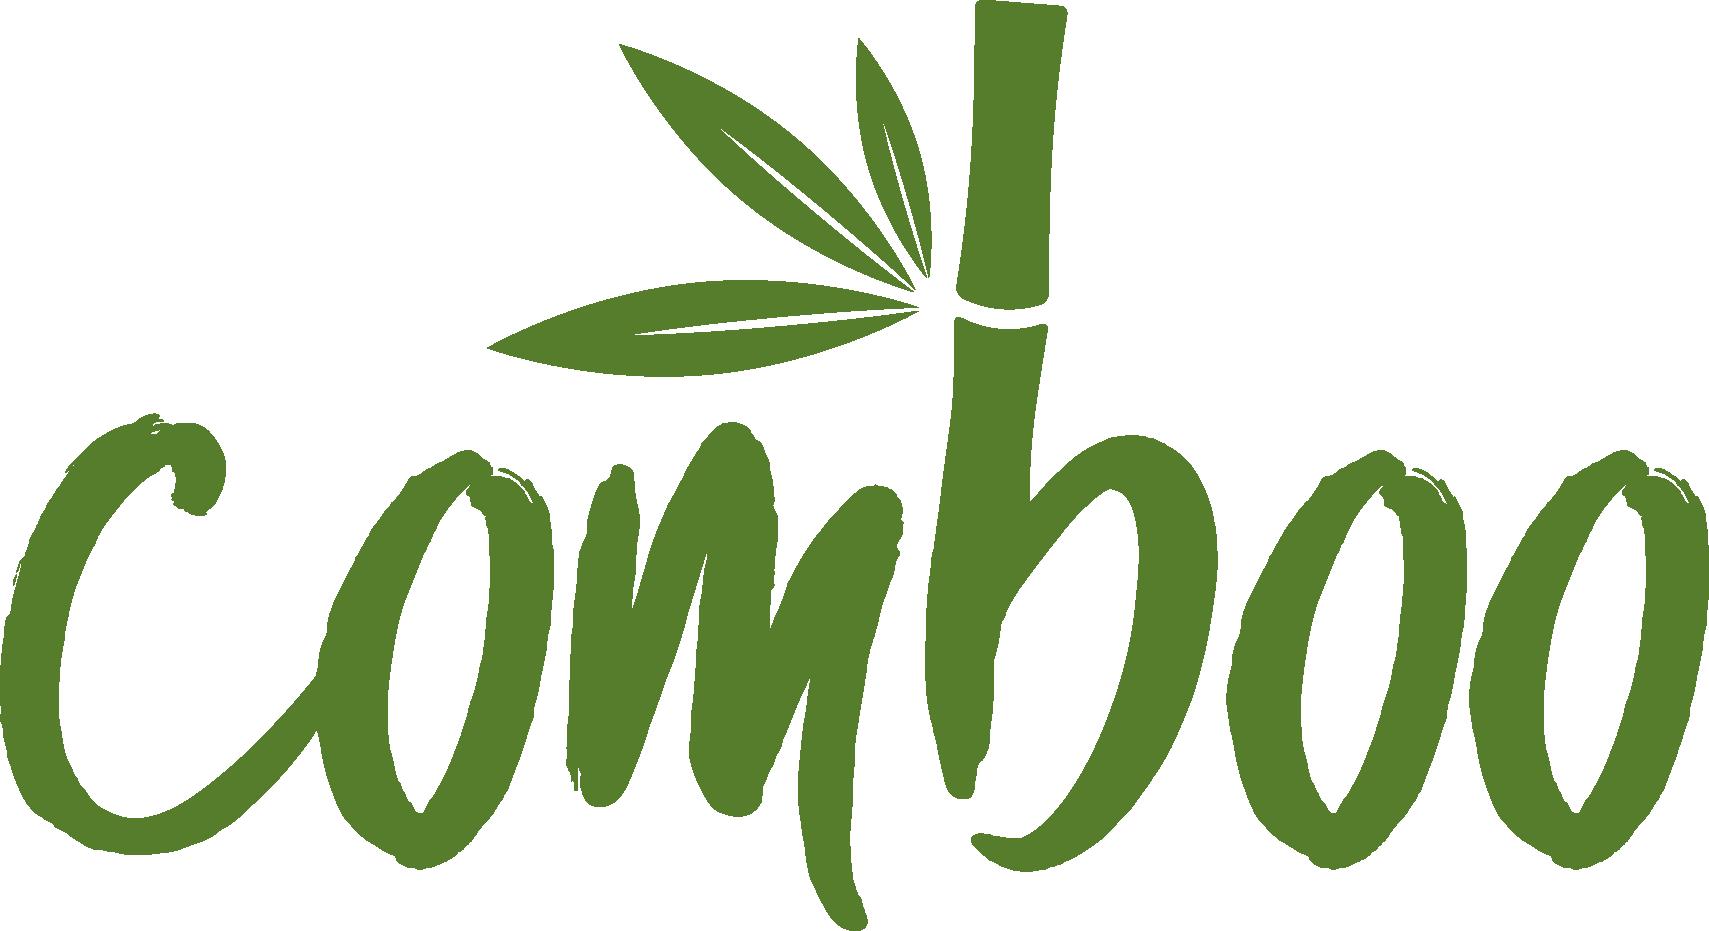 Bambus Strohhalme Ceres Webshop